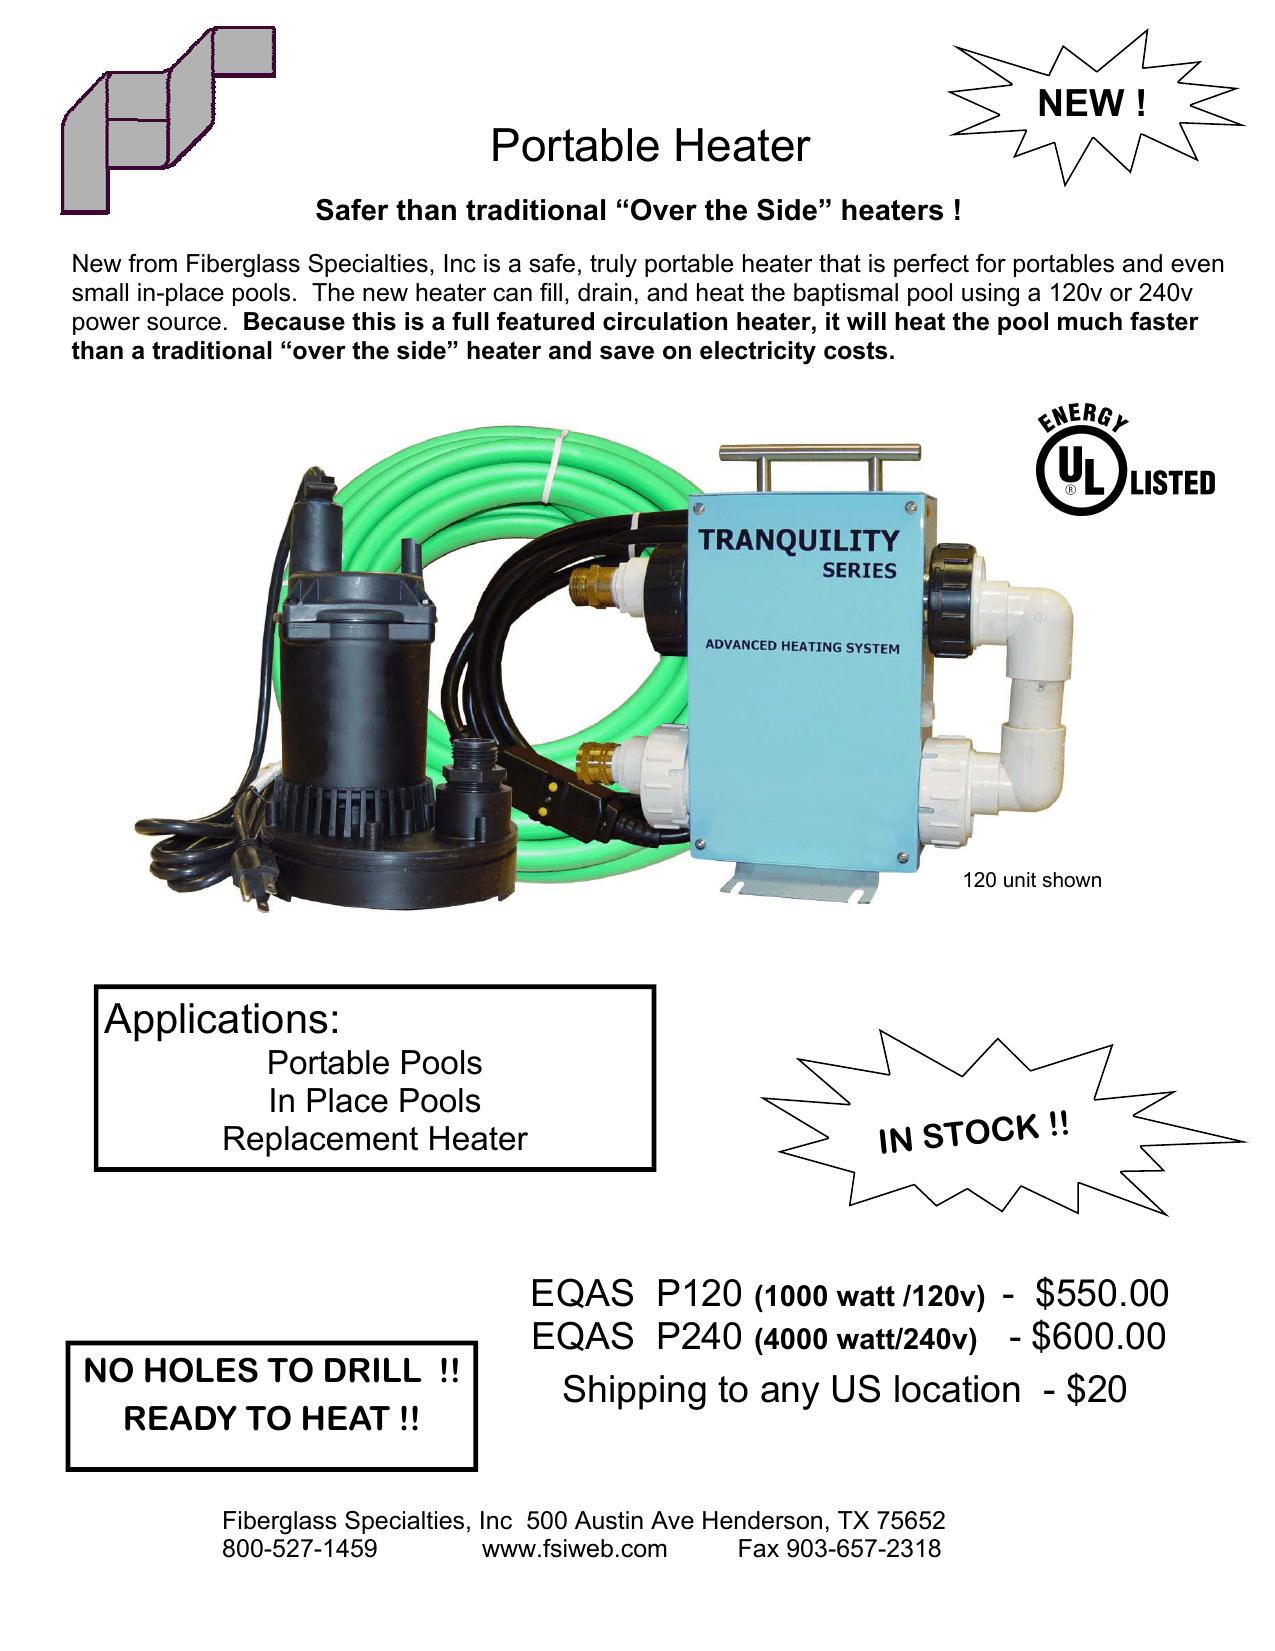 EQAS Portable Heater - Fibergl Specialties, Inc.   manualzz.com on pool heater flow diagram, hayward pool heater diagram, hot water tank wiring diagram, central air wiring diagram, dryer wiring diagram, boiler wiring diagram, jacuzzi wiring diagram, spa wiring diagram, 5 wire thermostat wiring diagram, solar wiring diagram, pool heater plumbing diagram, lights wiring diagram, pool heater installation, fan wiring diagram, gas stove wiring diagram, heating wiring diagram, a/c wiring diagram, electrical wiring diagram, pool wiring code diagrams, deck wiring diagram,